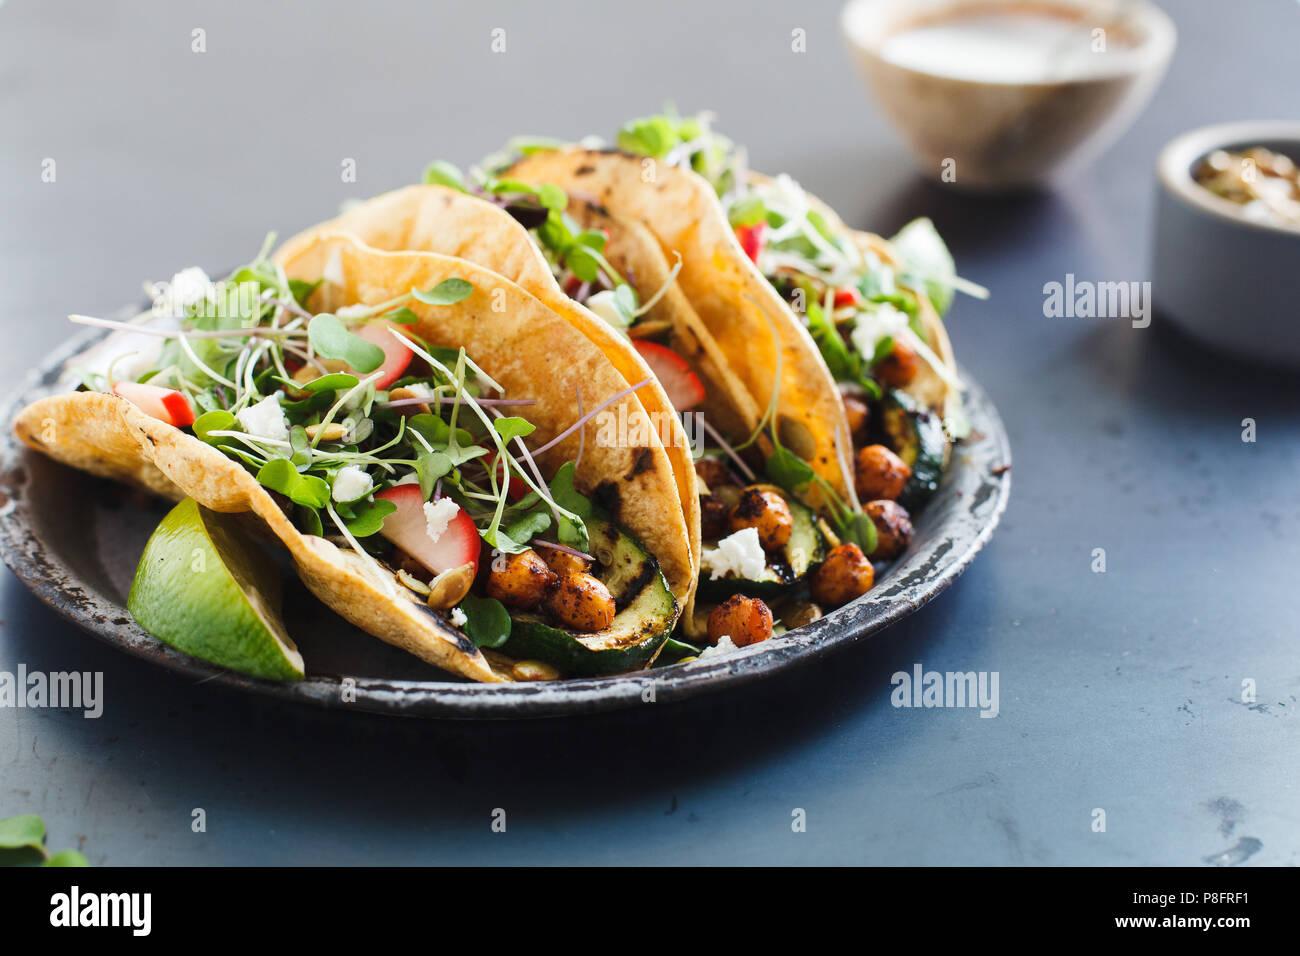 Vegetable tacos on blue background - Stock Image